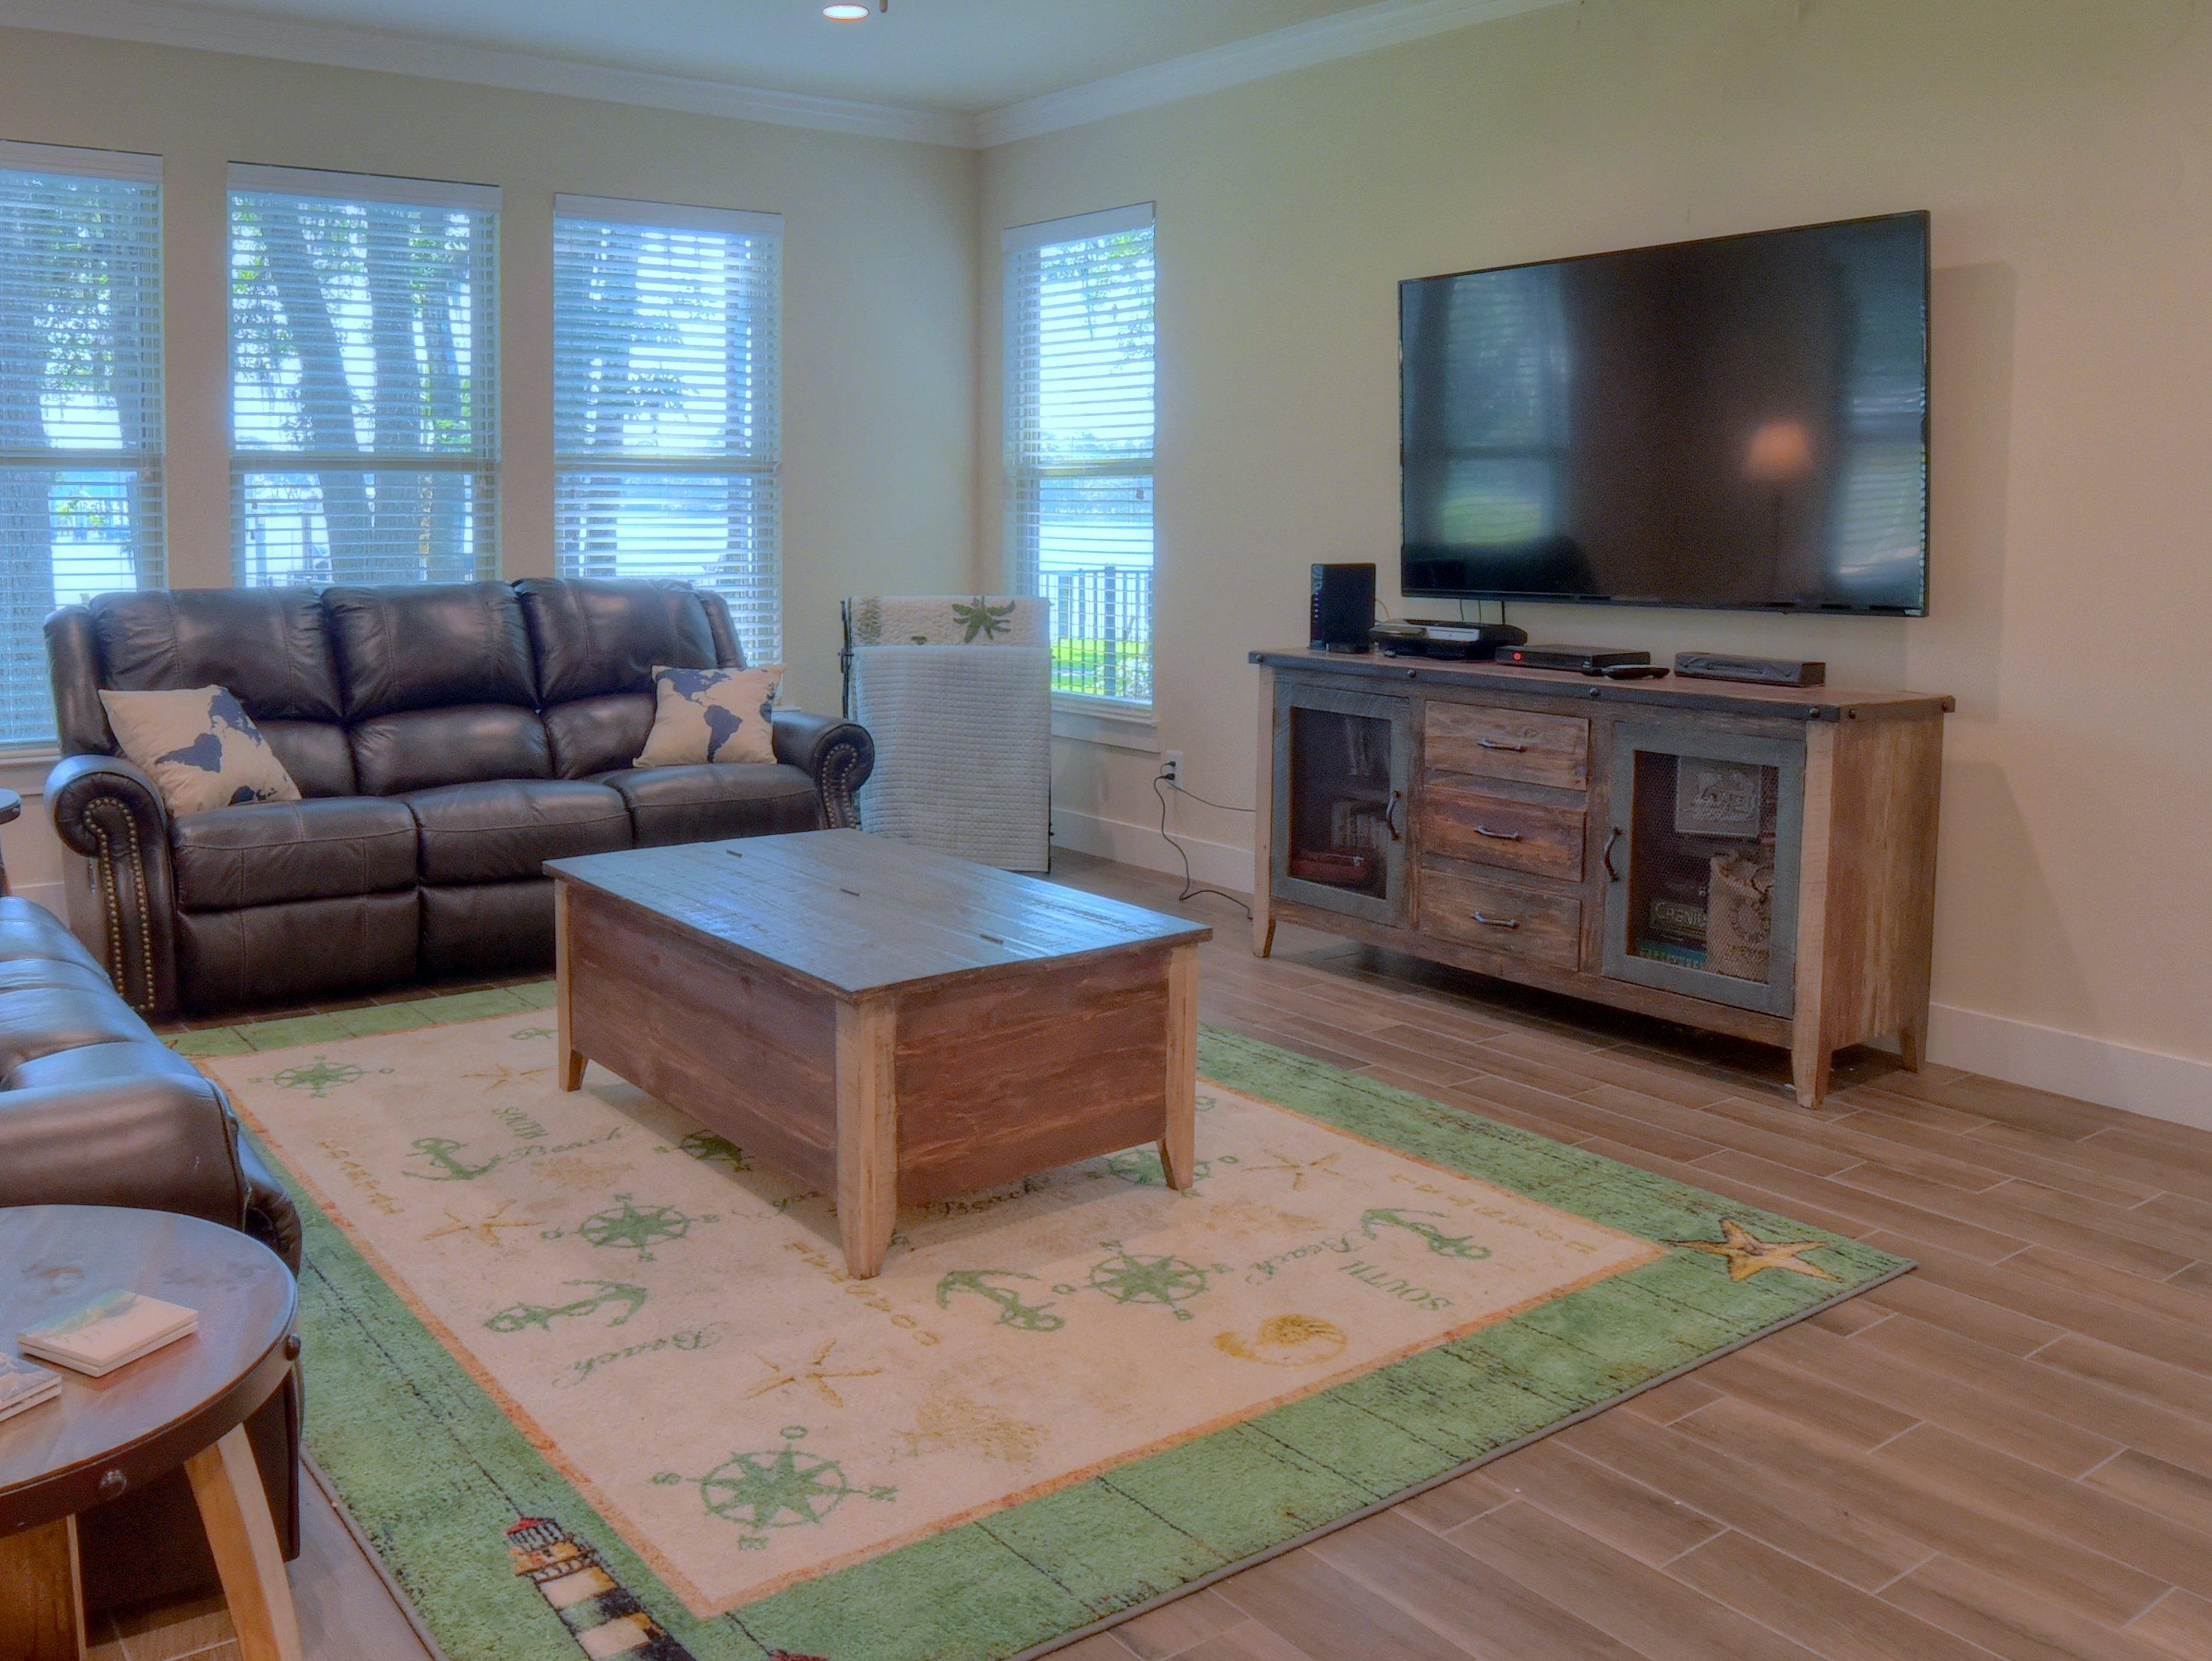 93 Beacon Point Condo rental in Sandestin Rentals ~ Cottages and Villas  in Destin Florida - #8